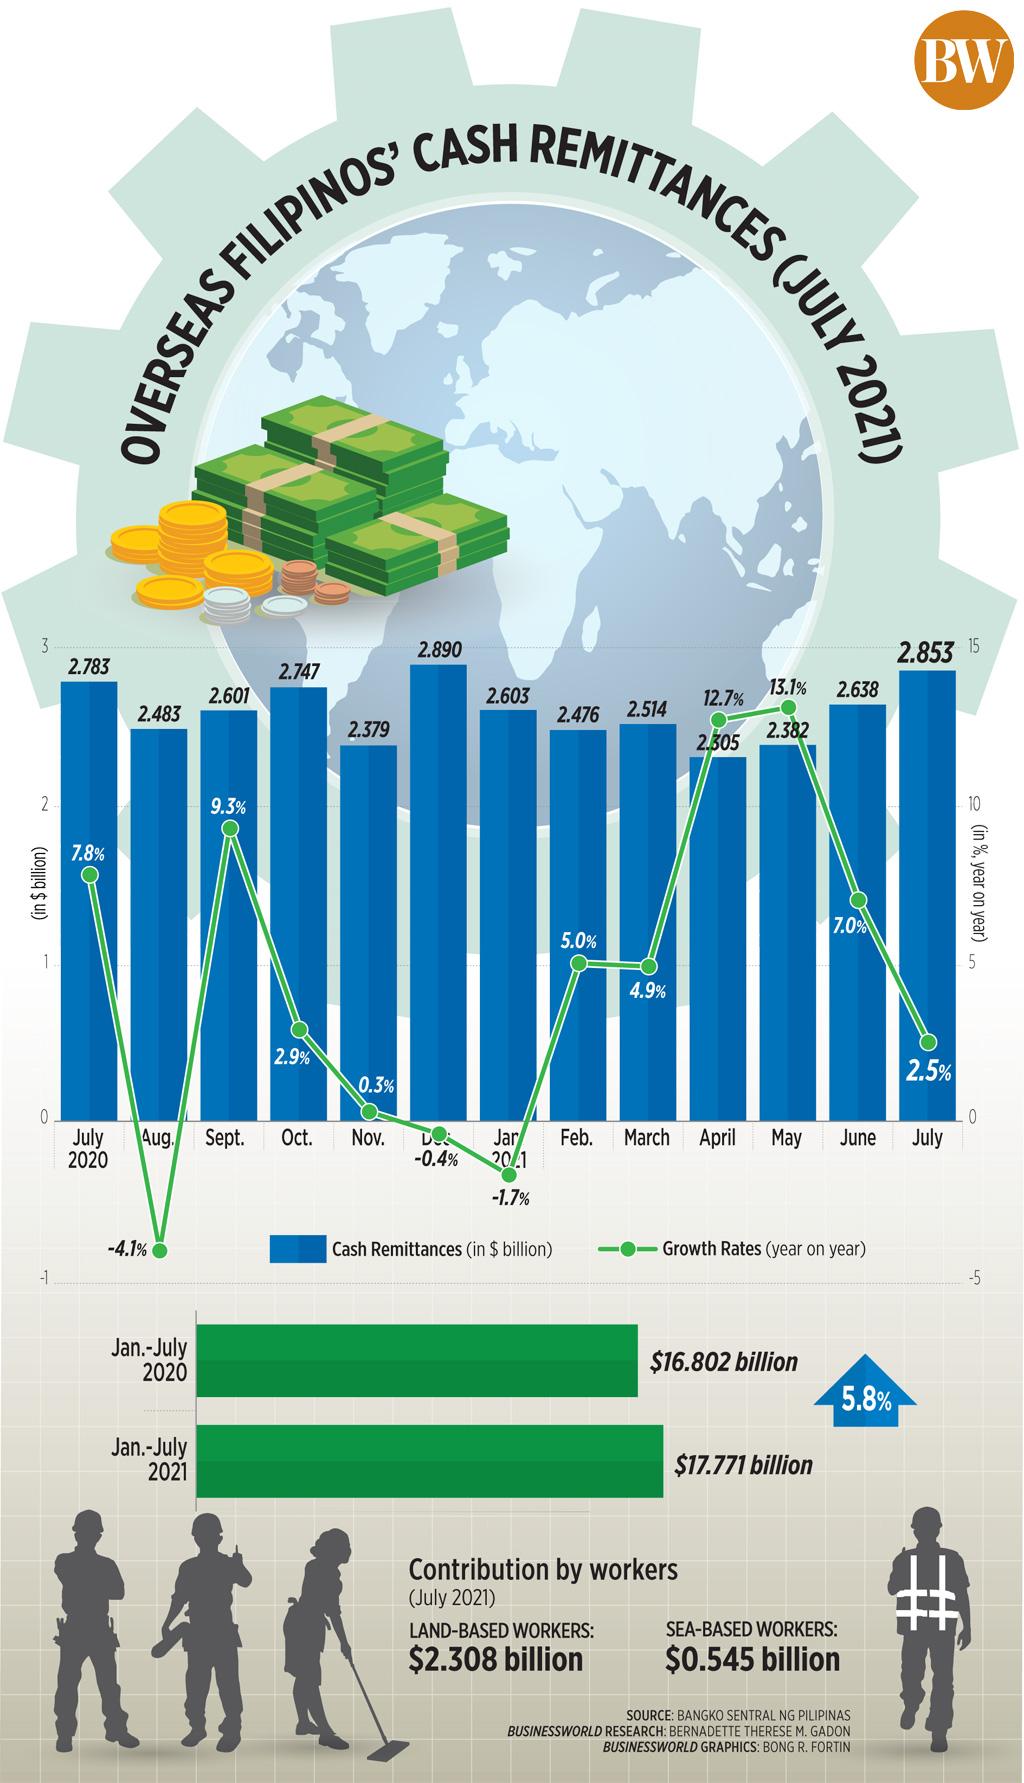 Overseas Filipinos' Cash Remittances (July 2021)